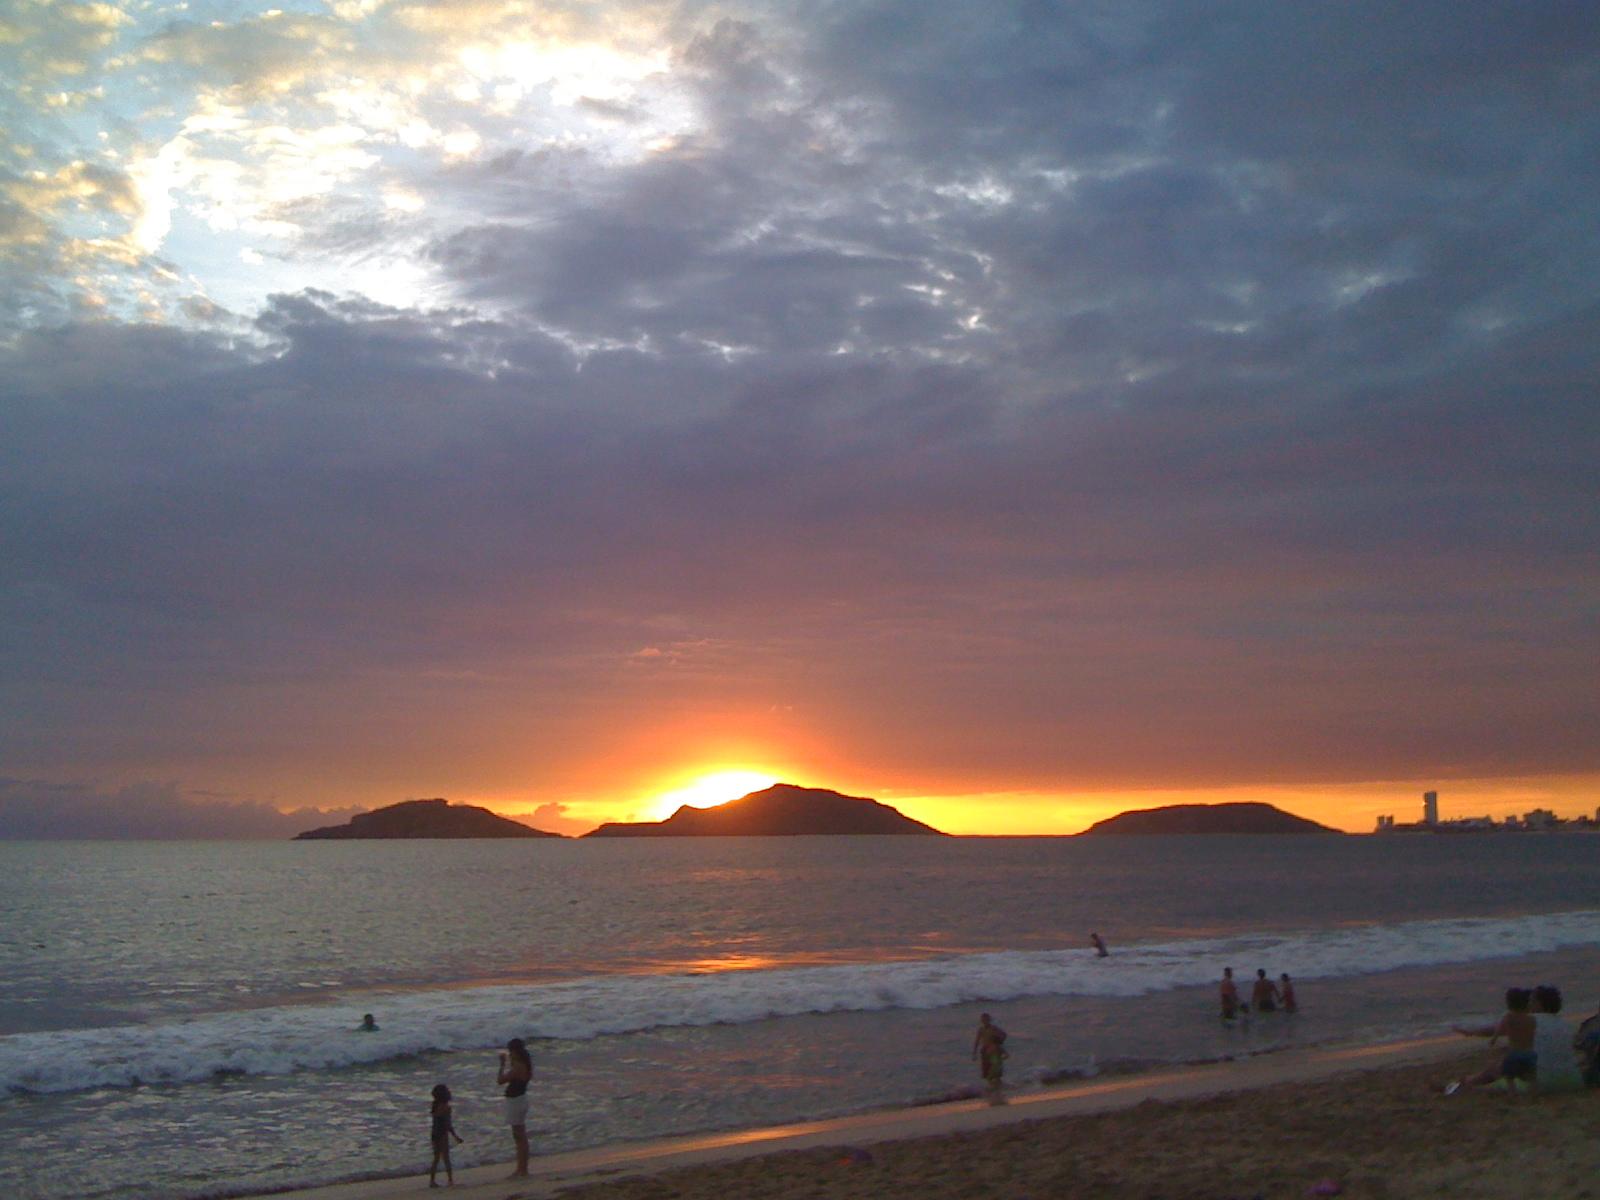 Las 3 islas sunset 3